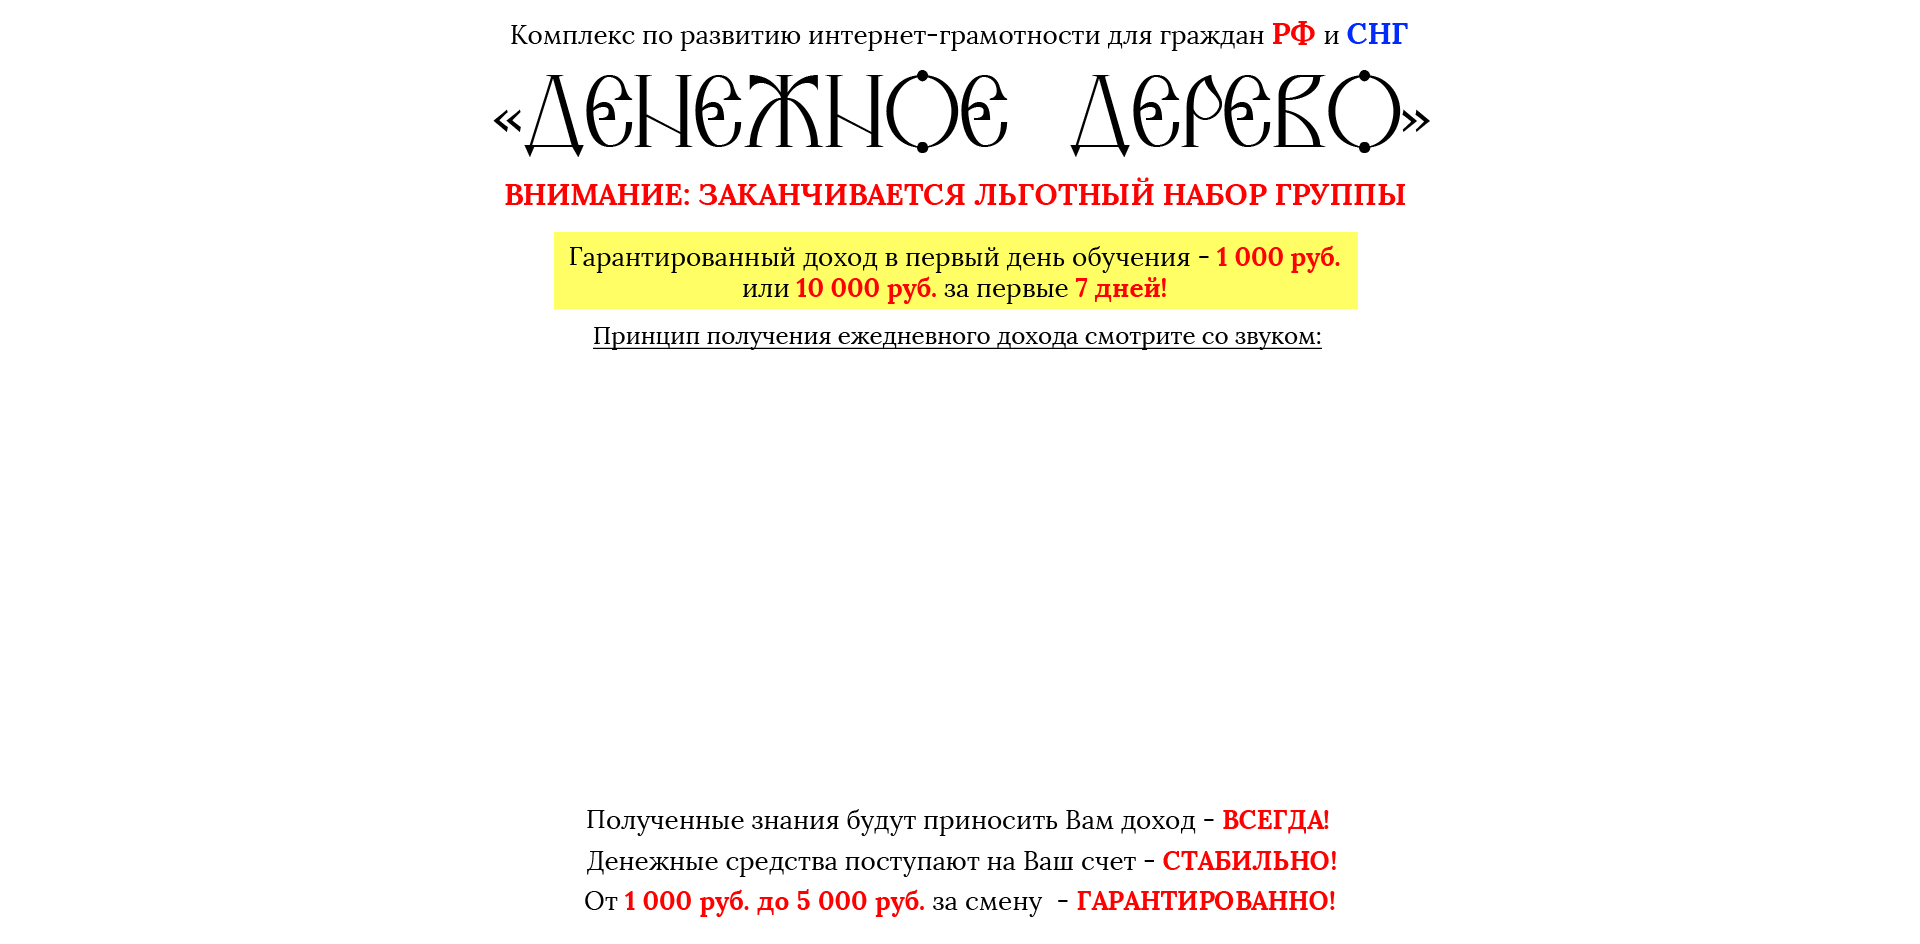 http://media.lpgenerator.ru/images/184484/1_ghSG3pw.jpg#size_1920x944